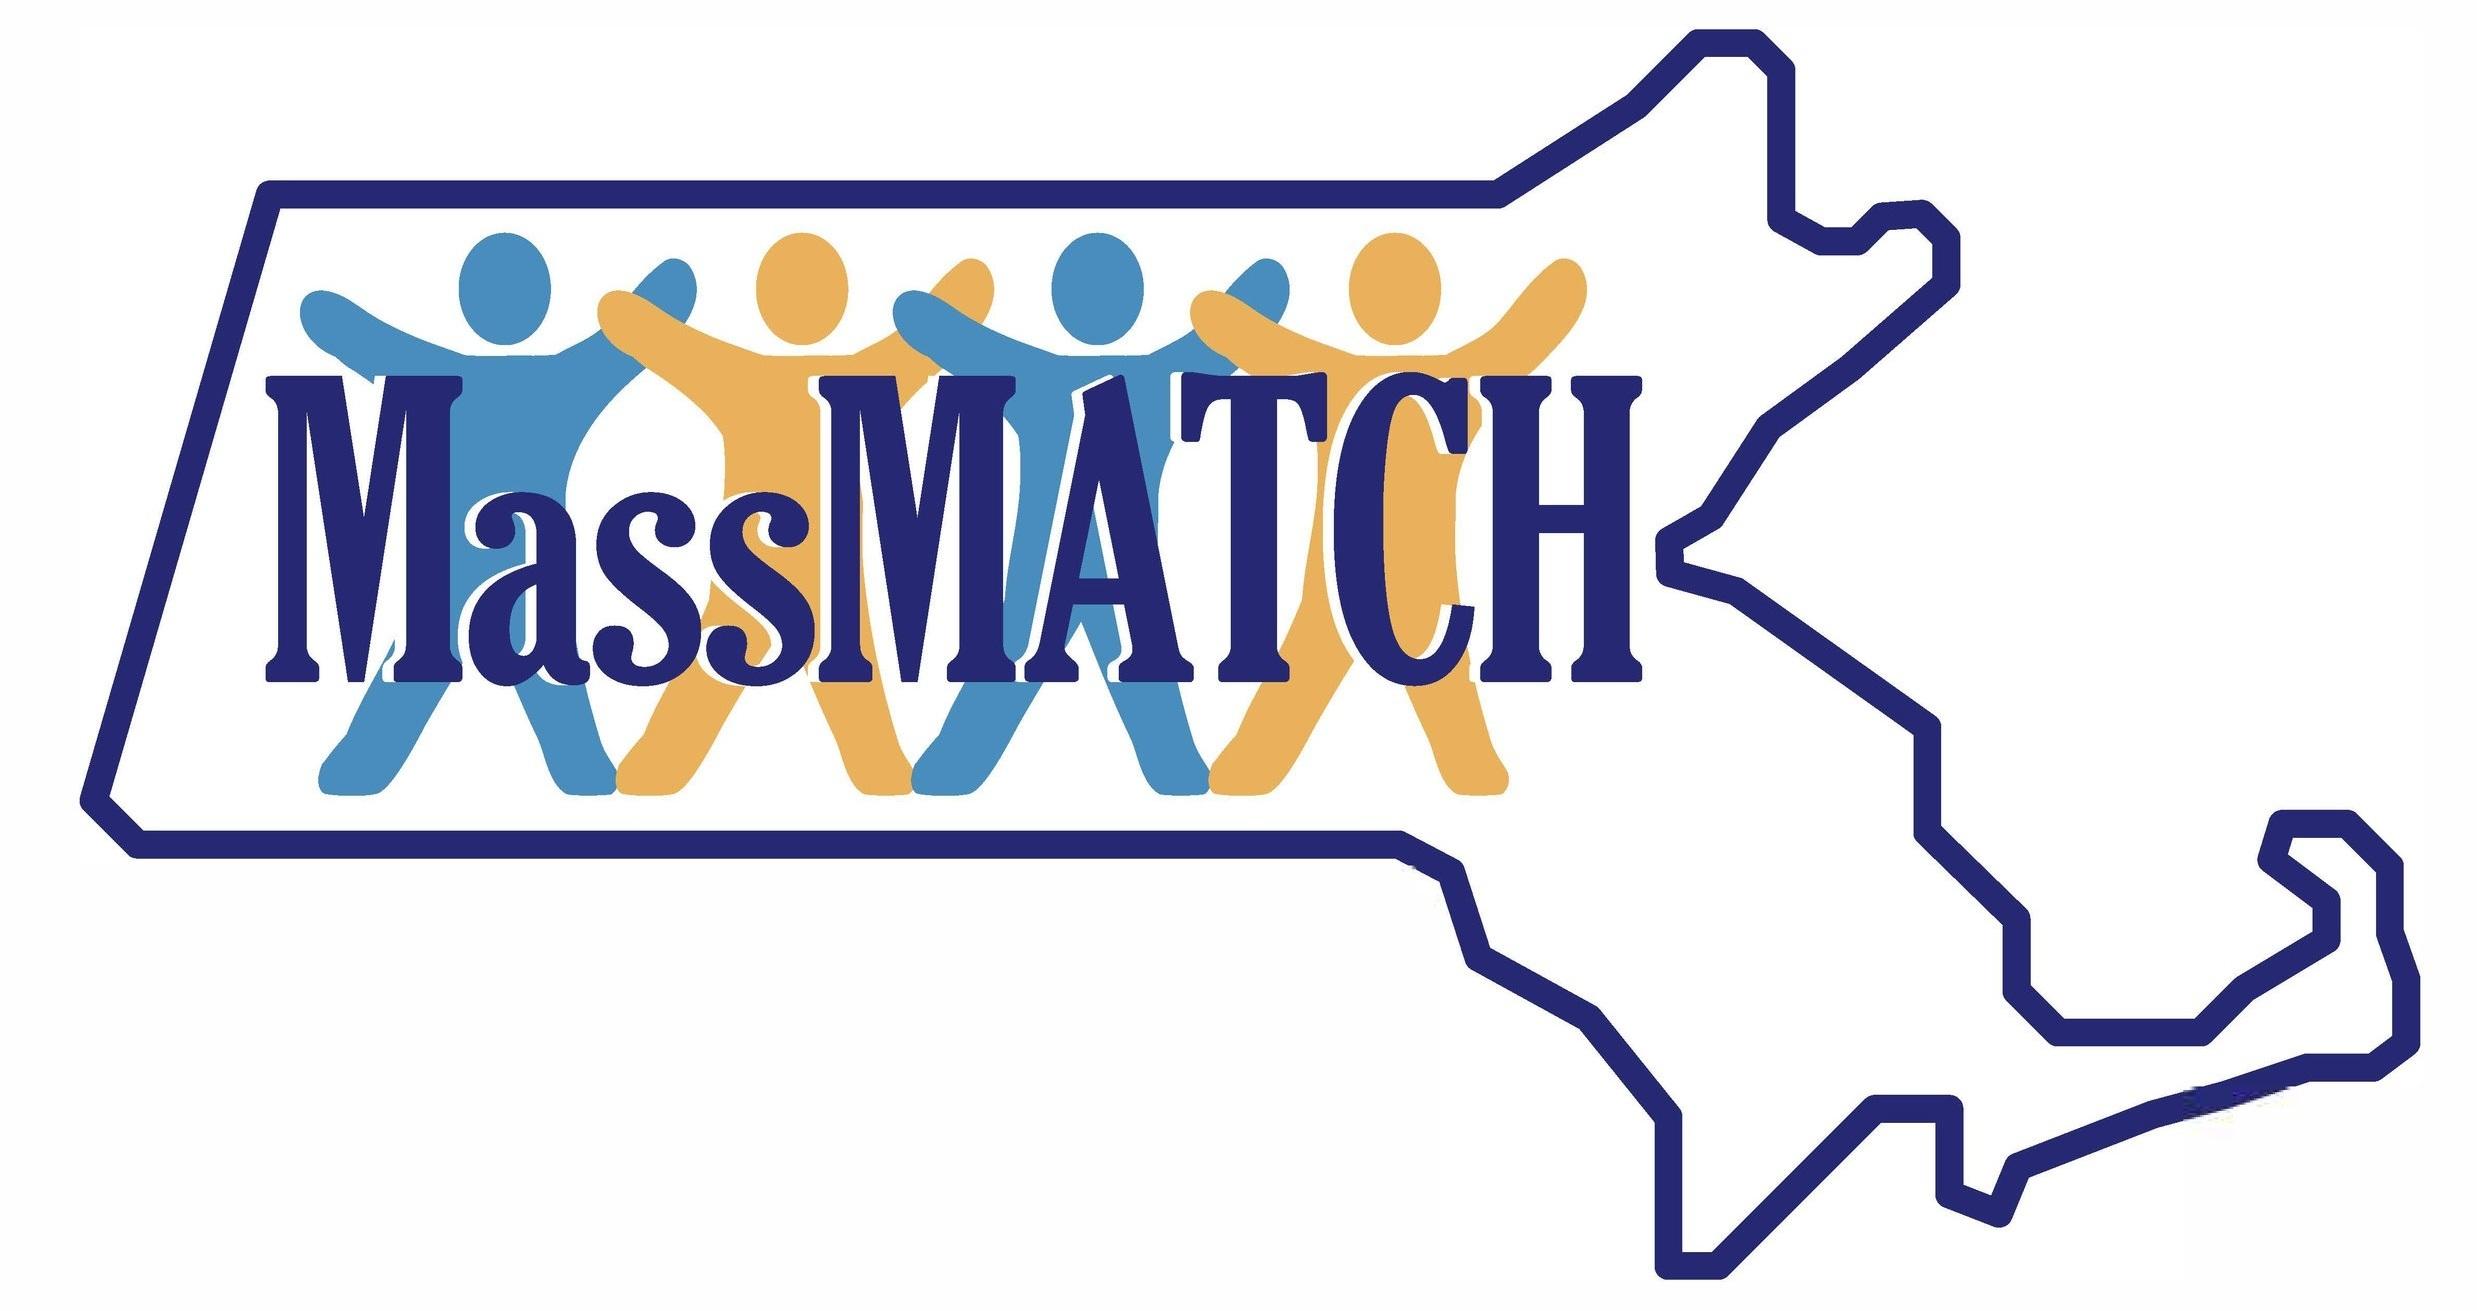 Mass match Logo. Maximizing assistive technology in consumer's hands